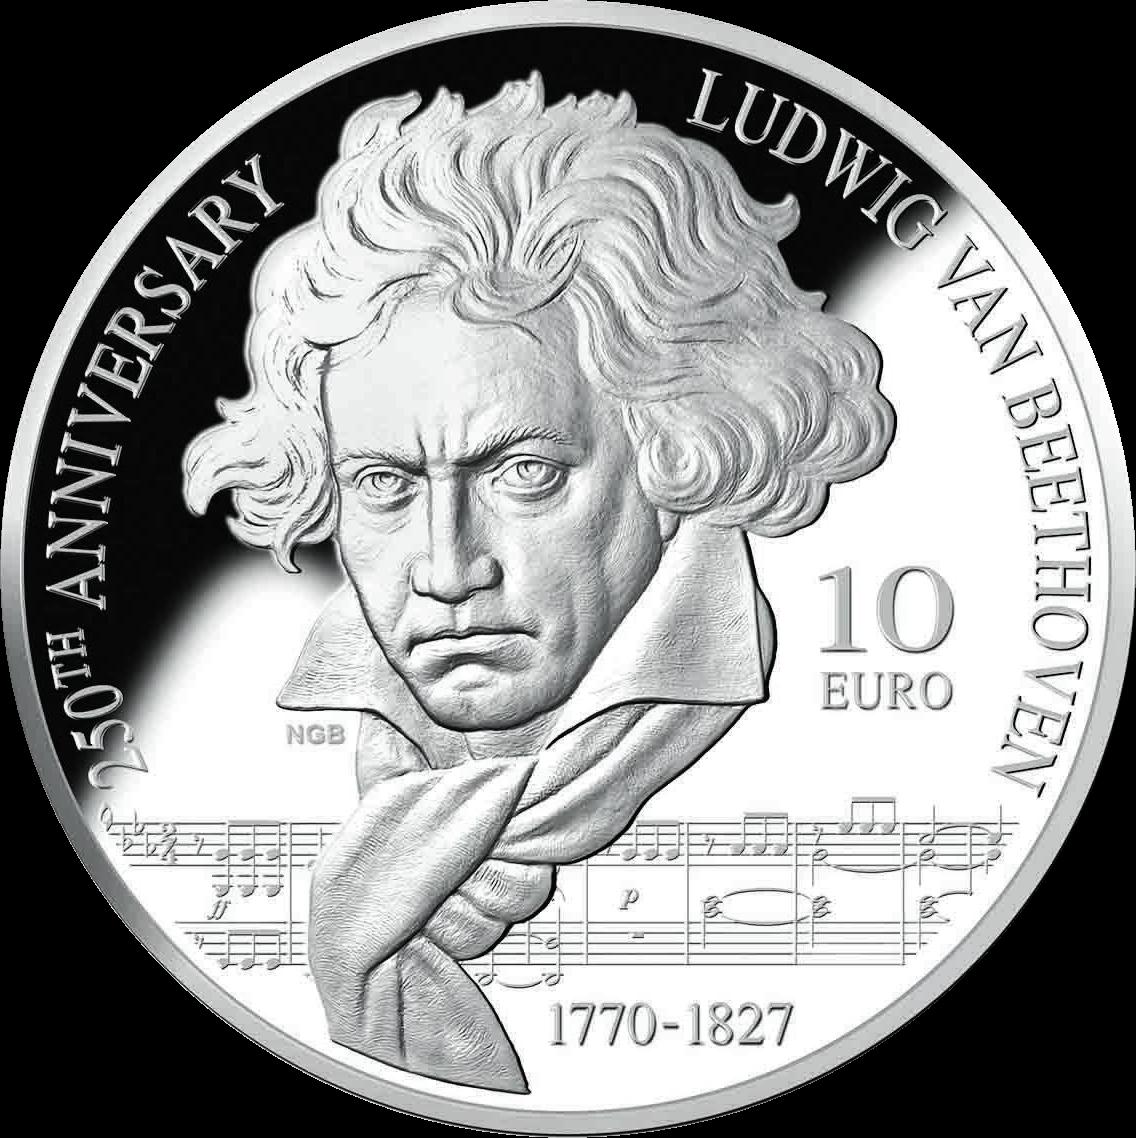 Мальта монета 10 евро Людвиг ван Бетховен, реверс